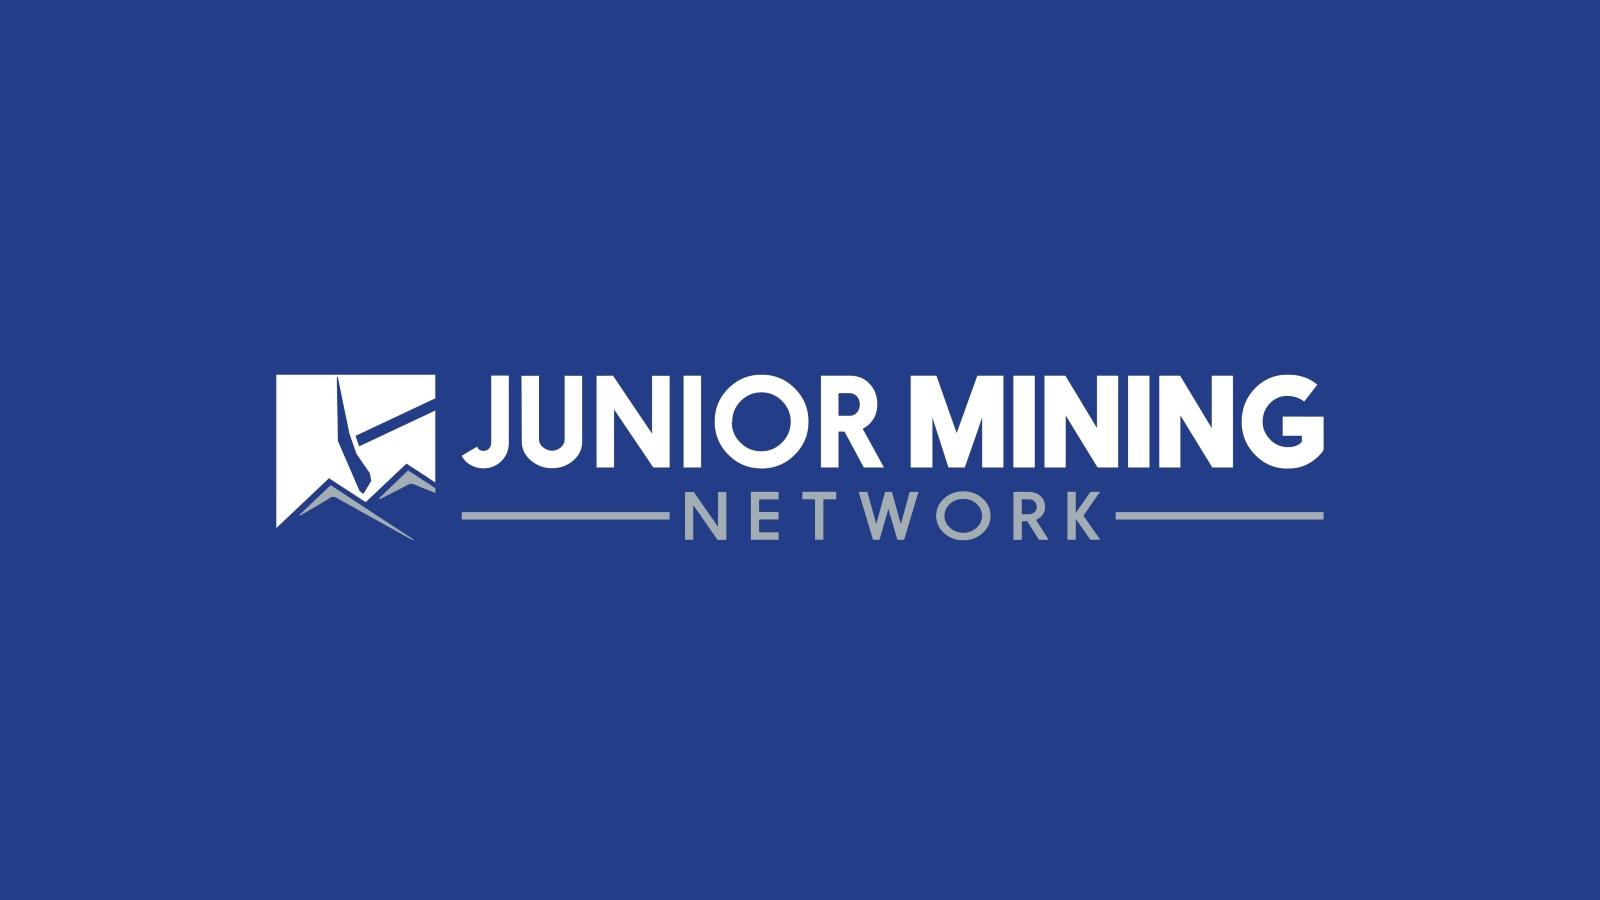 GoviEx Uranium Announces Chirundu Mining License in Zambia has been Re-instated